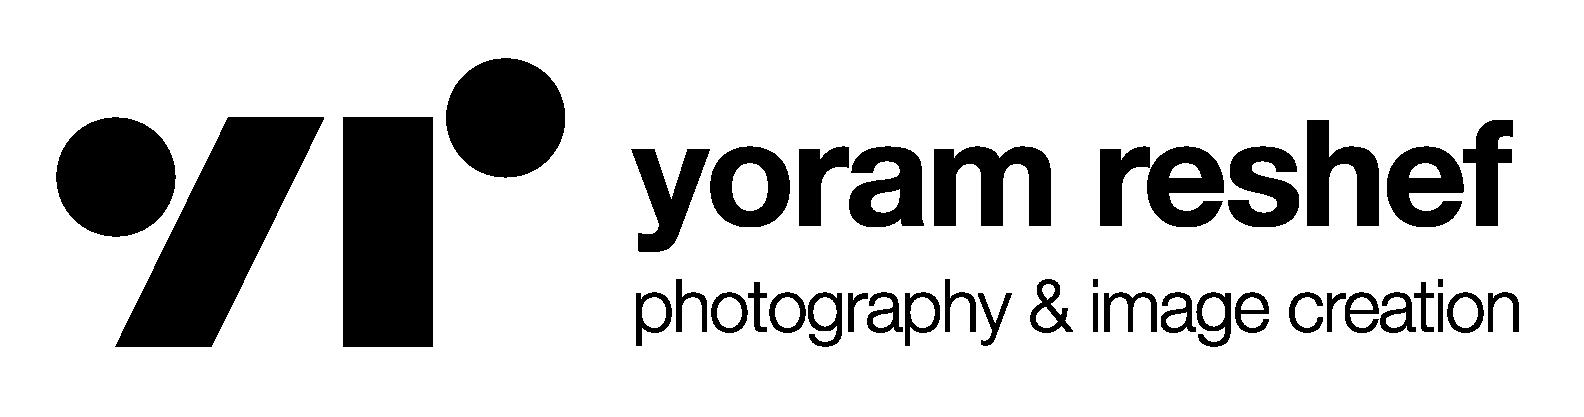 Yoram Reshef